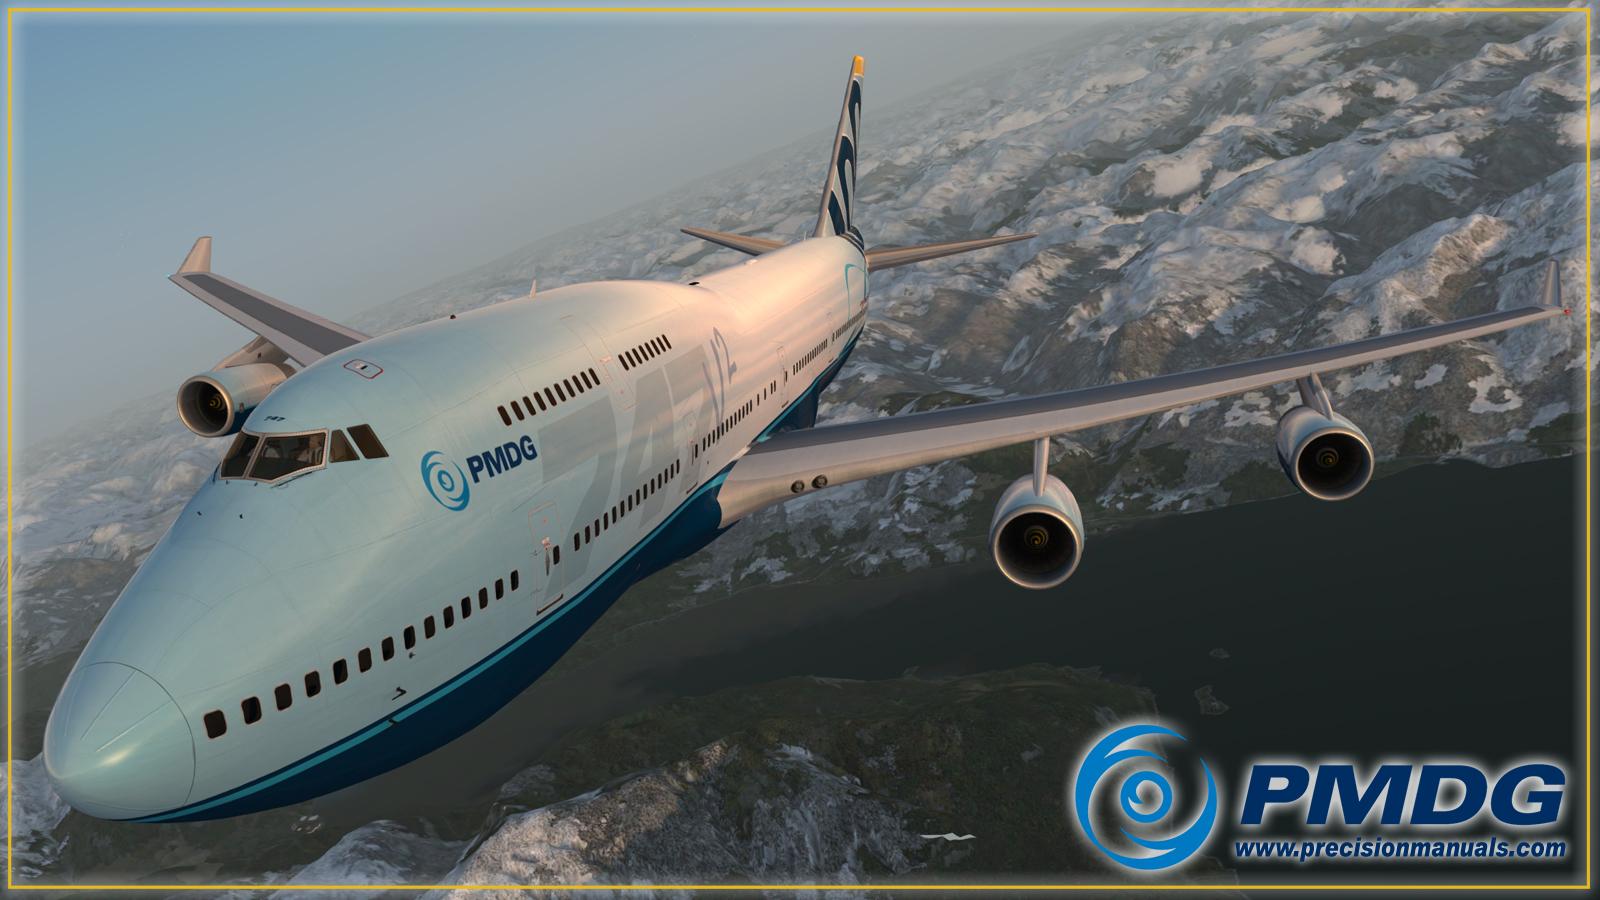 A Whole Lotta 747-400 Goodness!